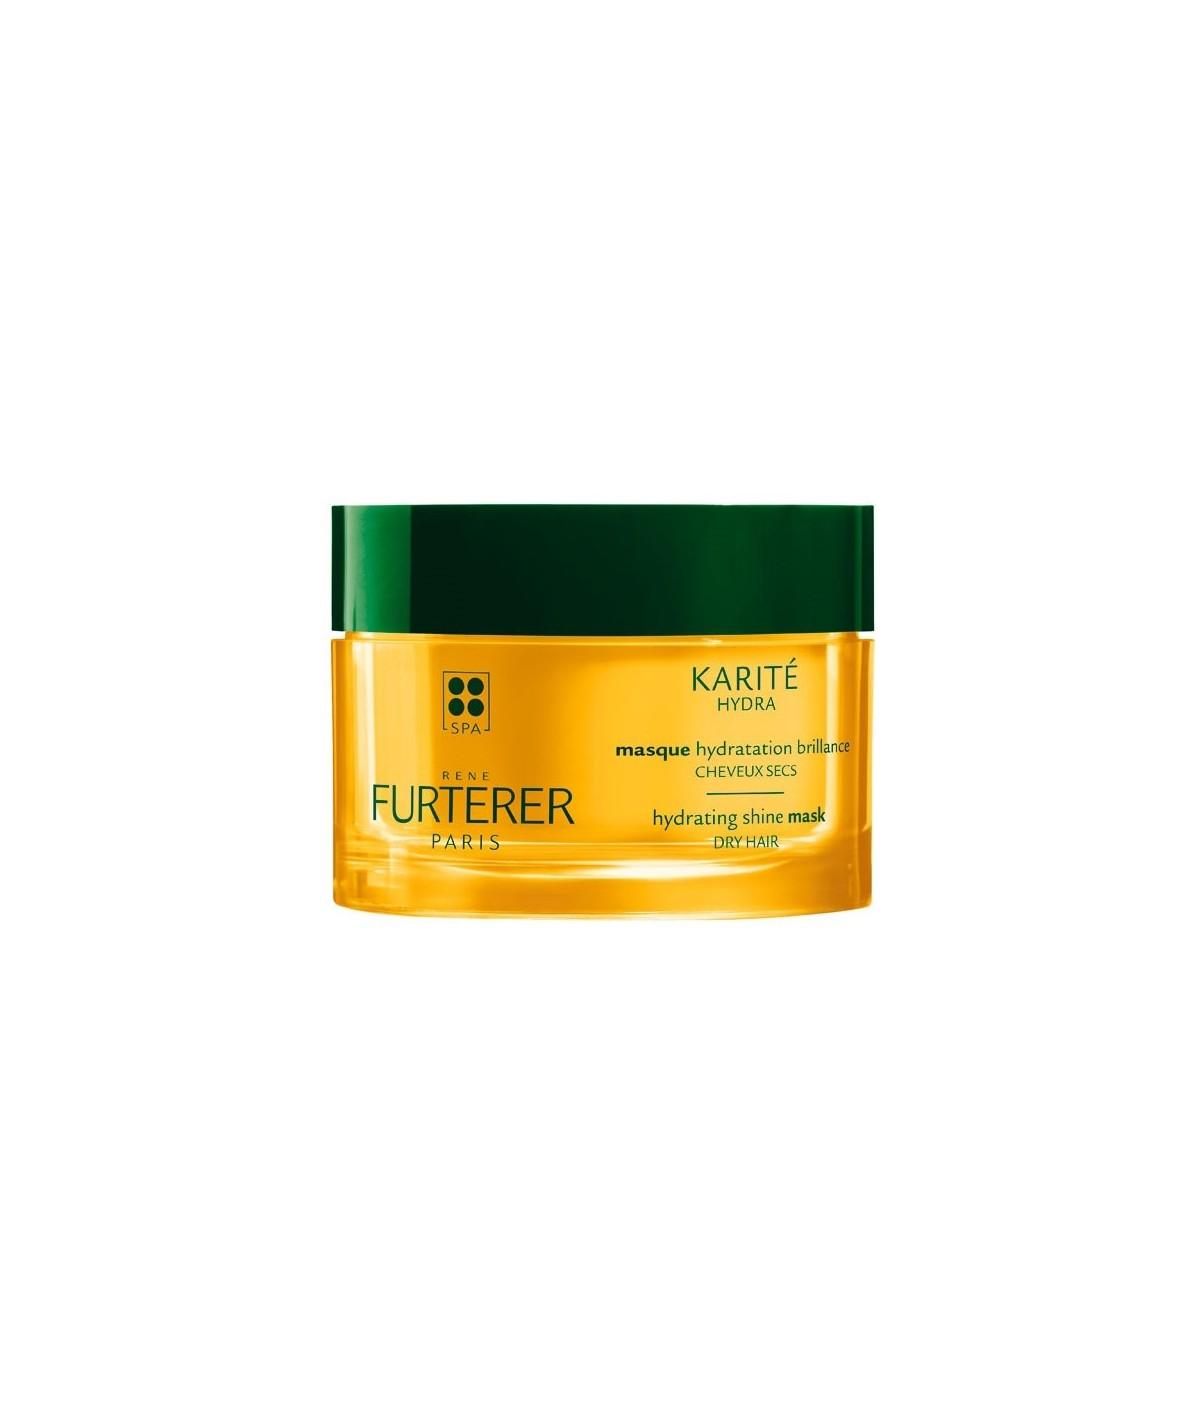 Rene Furterer Mascarilla Karité Hydra 200ml